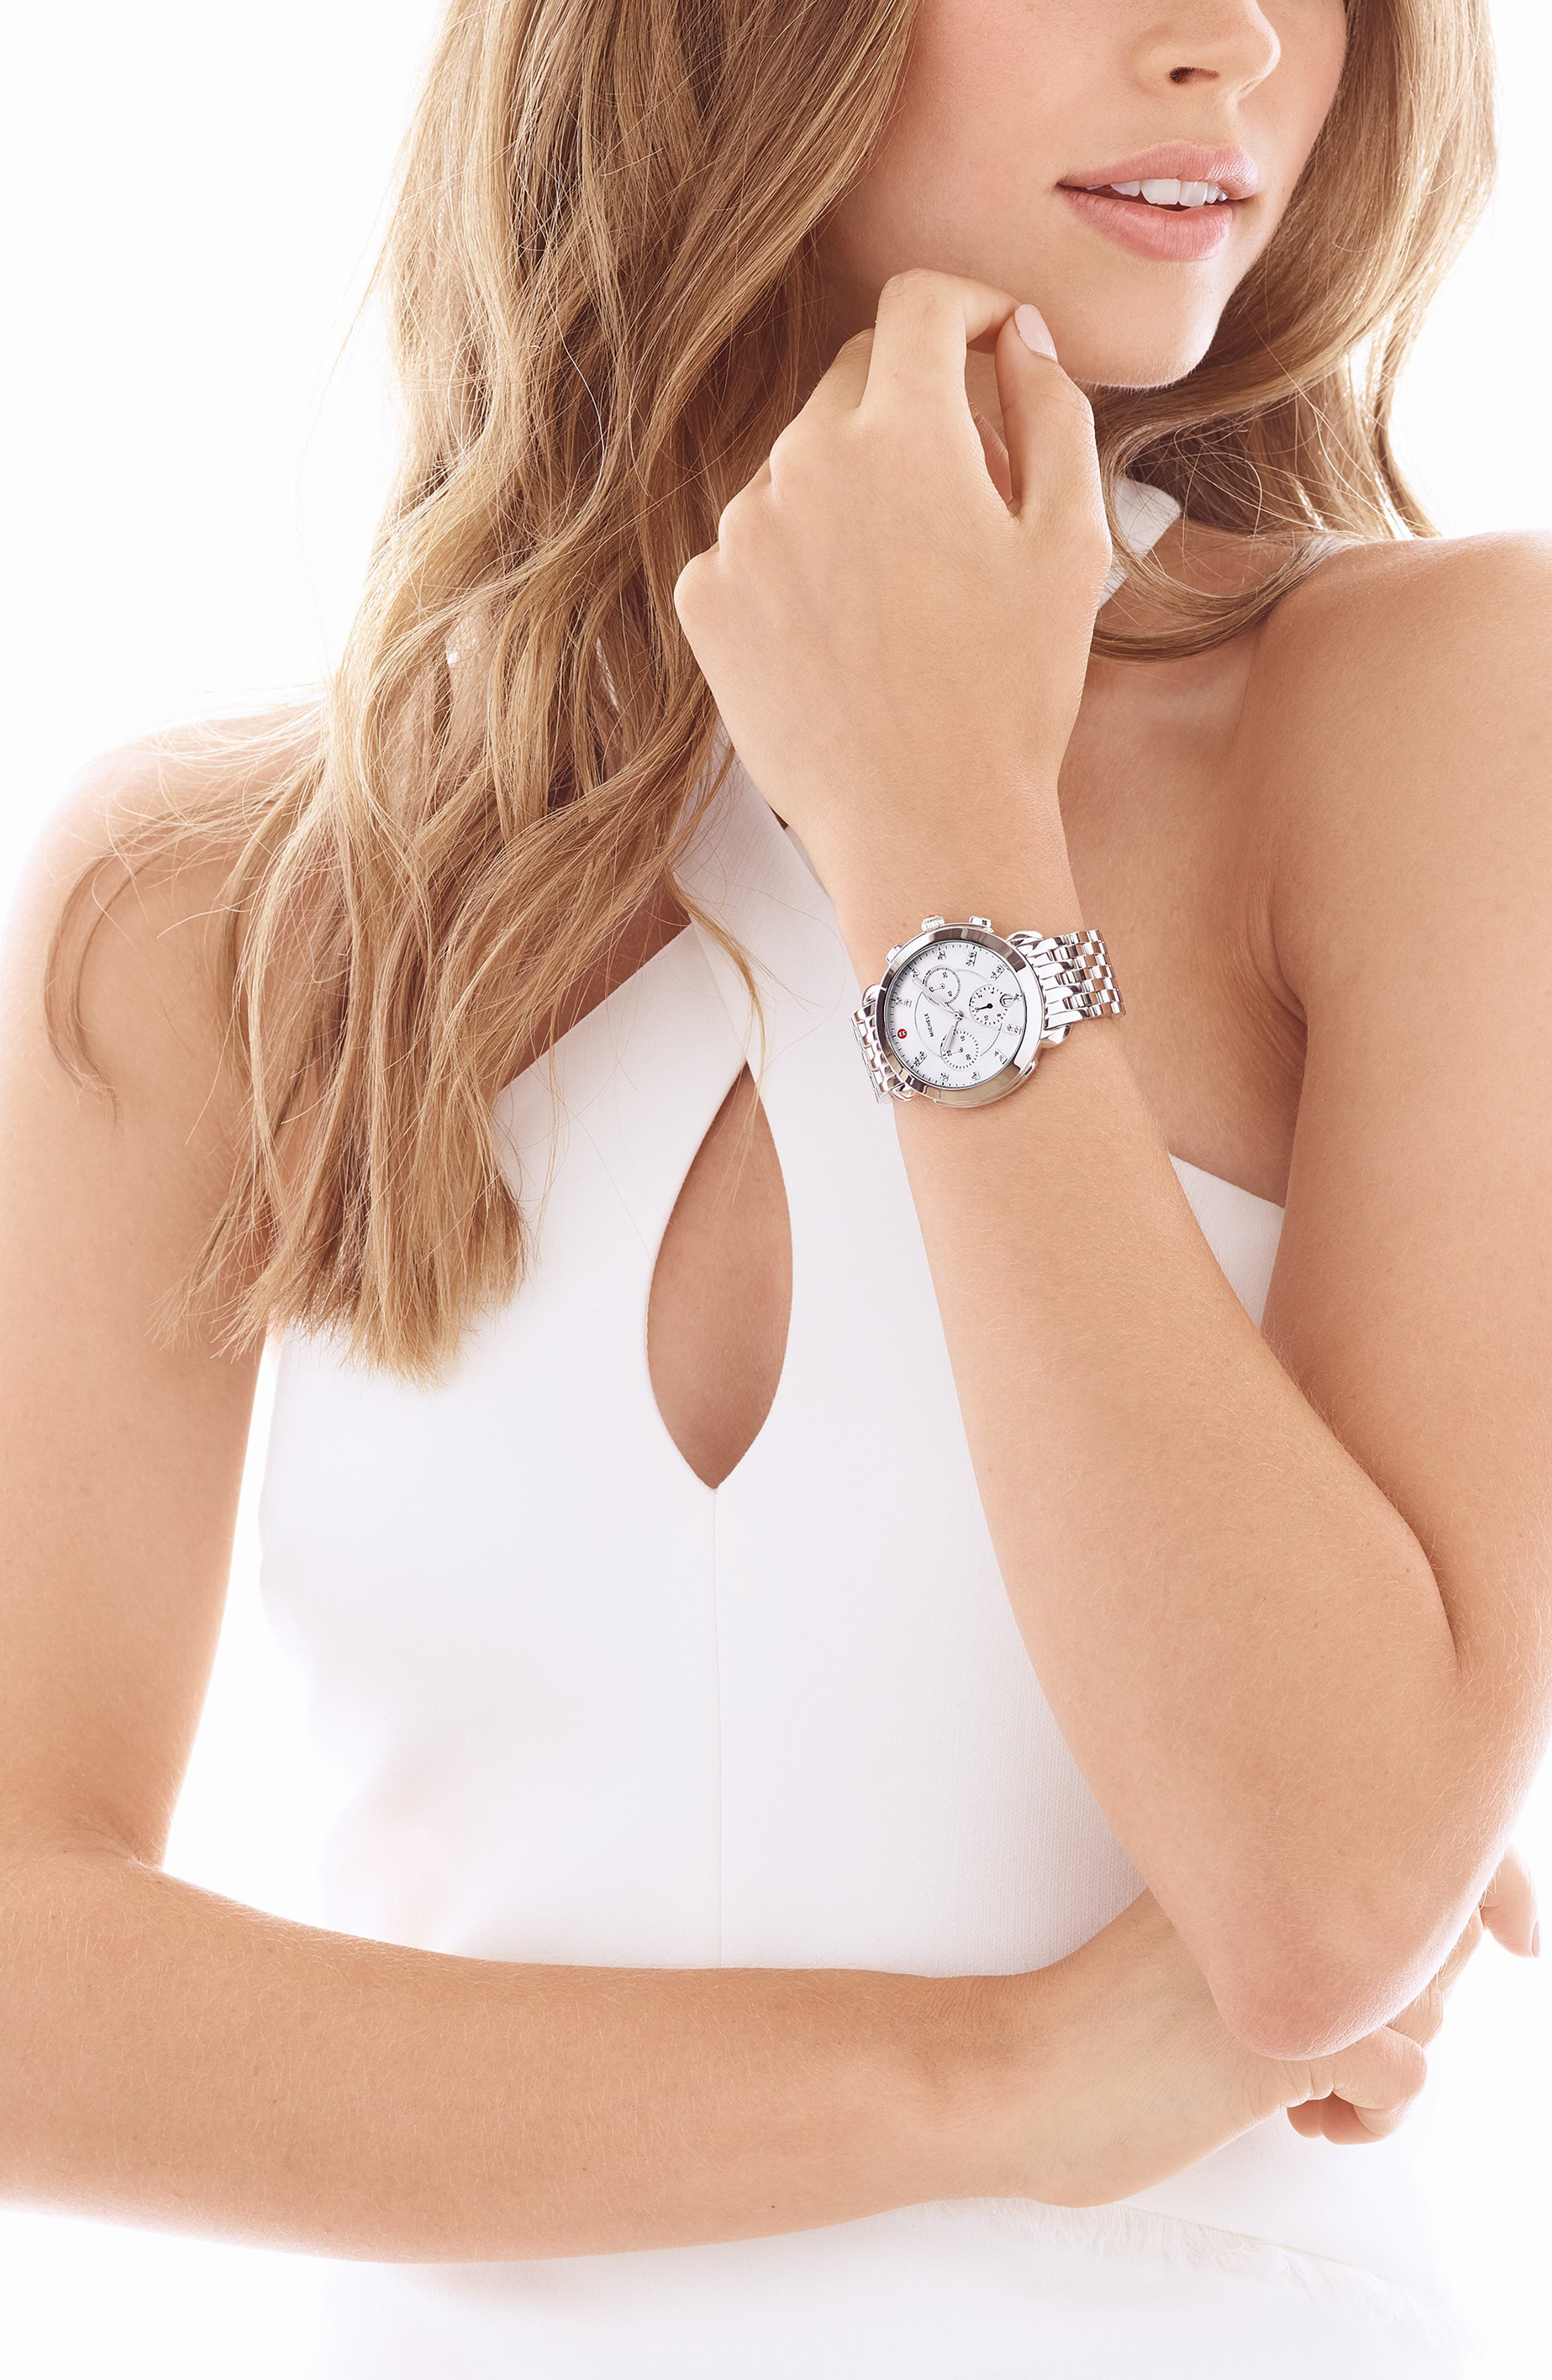 MICHELE, Sidney Chronograph Diamond Watch Head, 38mm, Alternate thumbnail 2, color, SILVER/ MOP